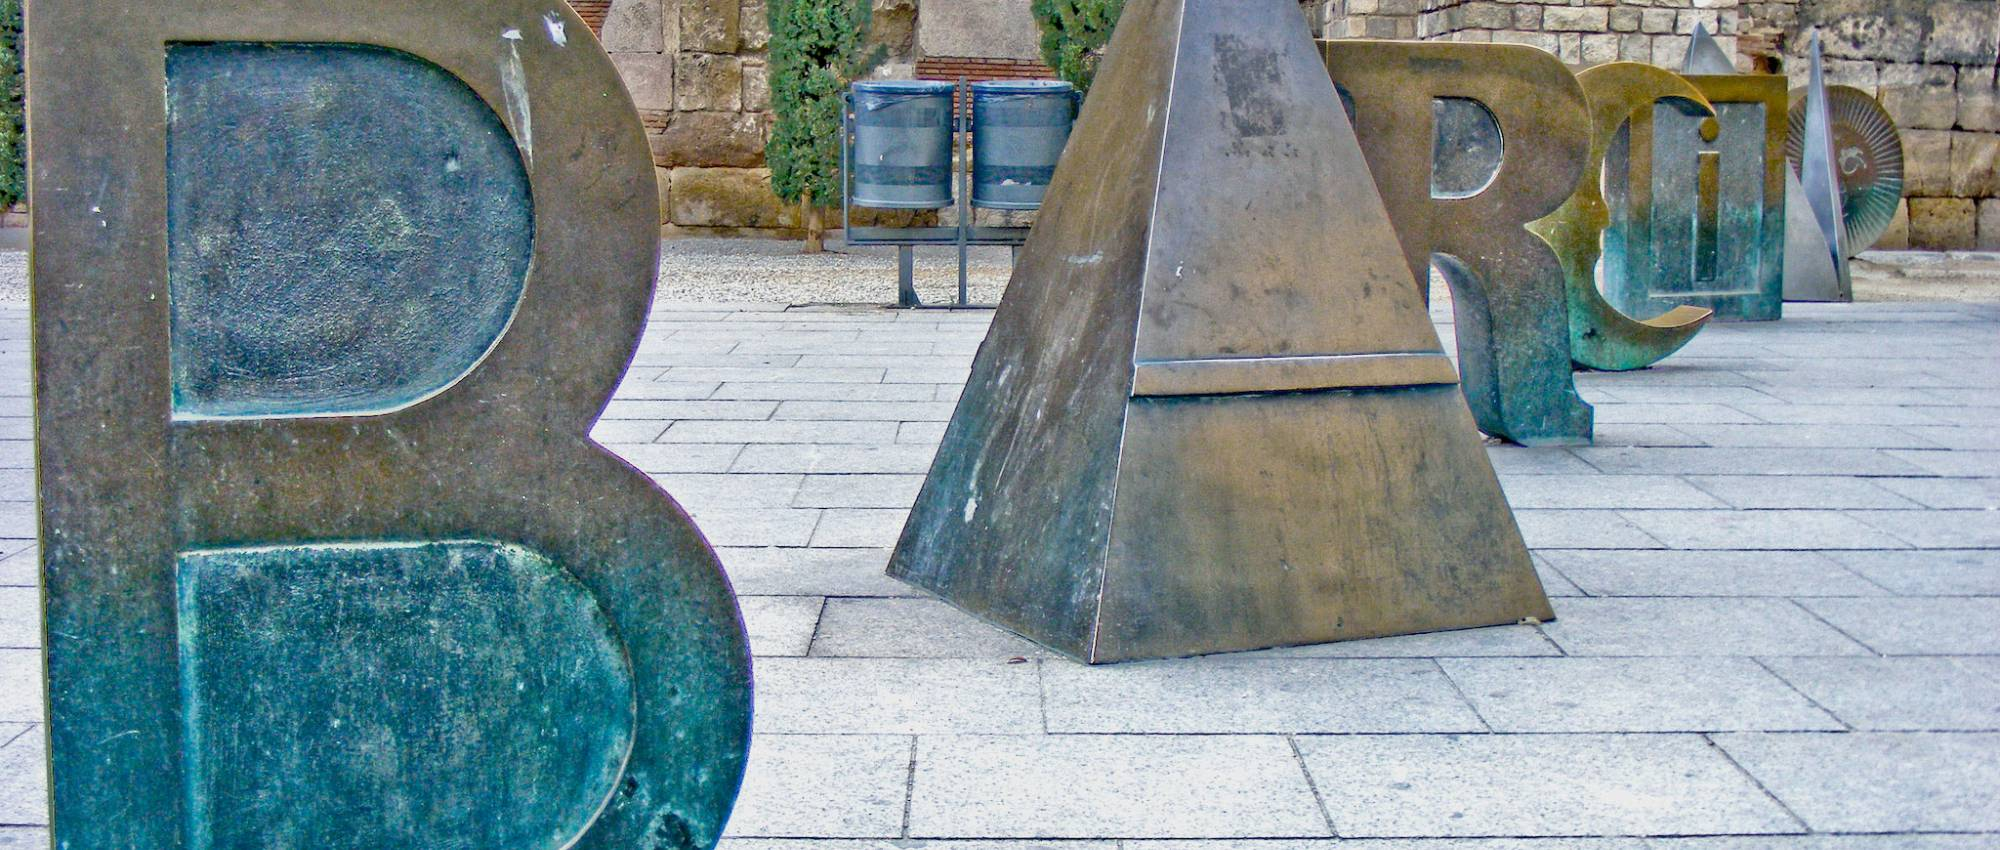 "Joan Brossa: ""Bàrcino"". Xavier Caballe / Wikimedia Commons. CC BY-SA 2.0"